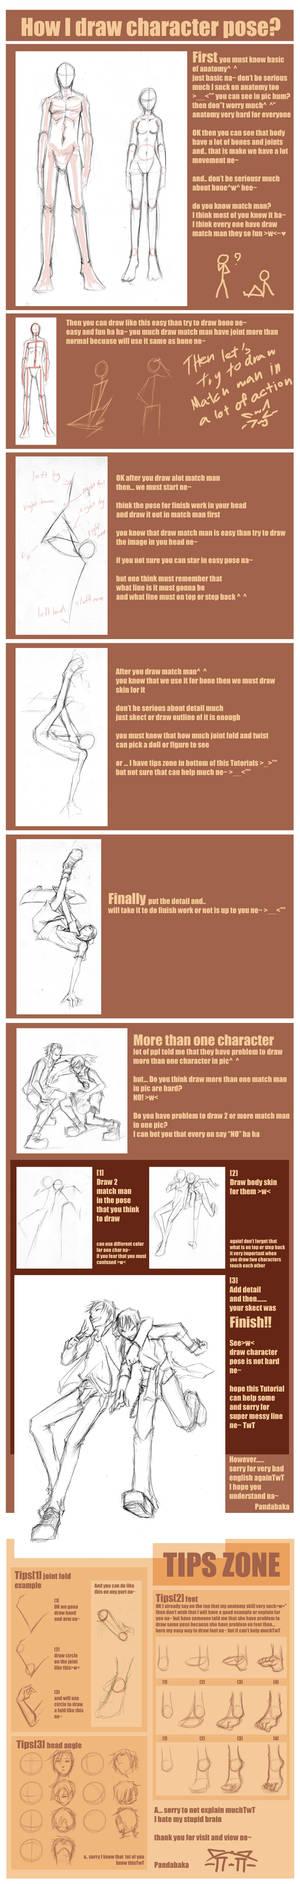 How I draw char. pose by pandabaka